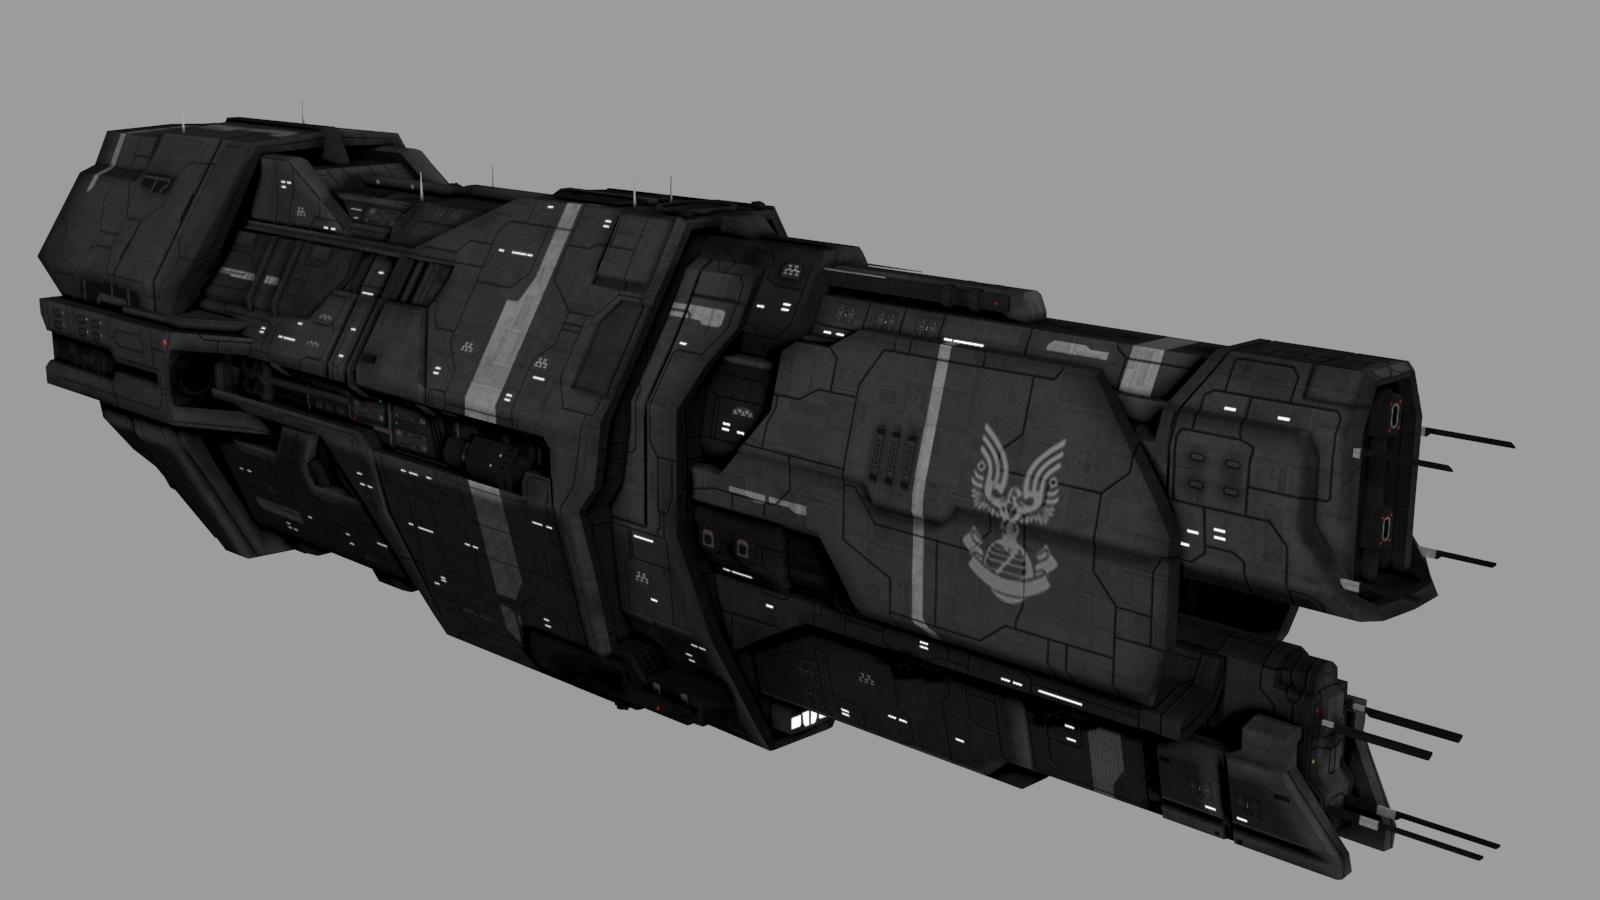 Athena-class Command Cruiser